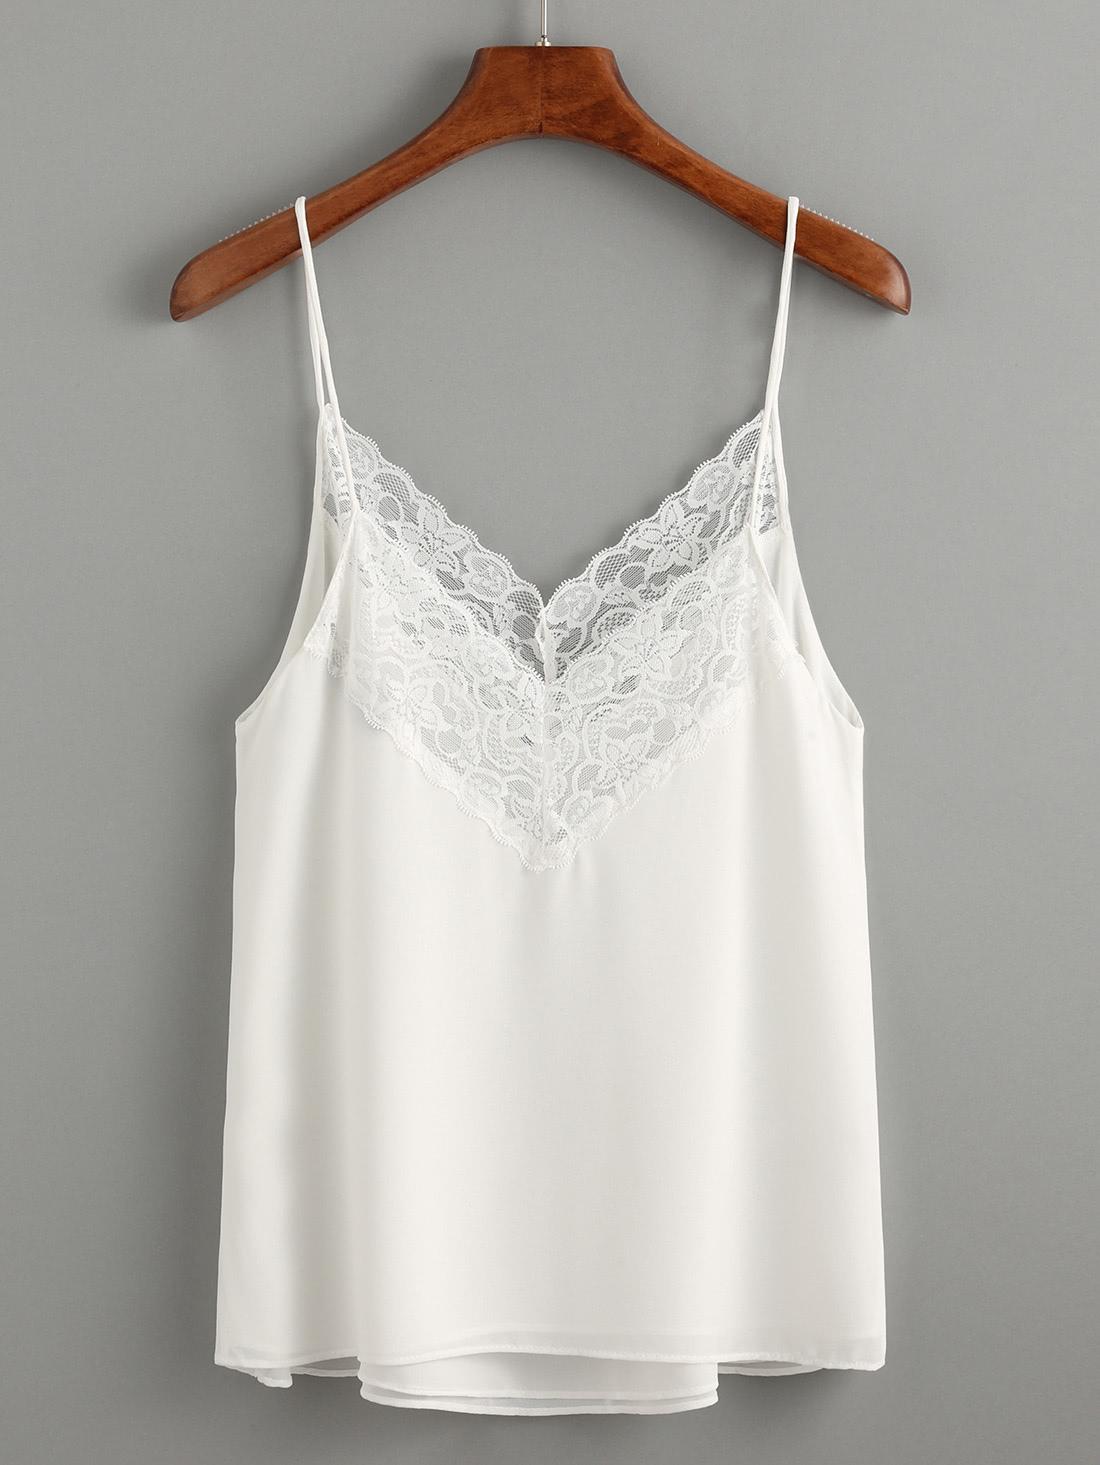 White Lace Trim Chiffon Cami Top vest160609029